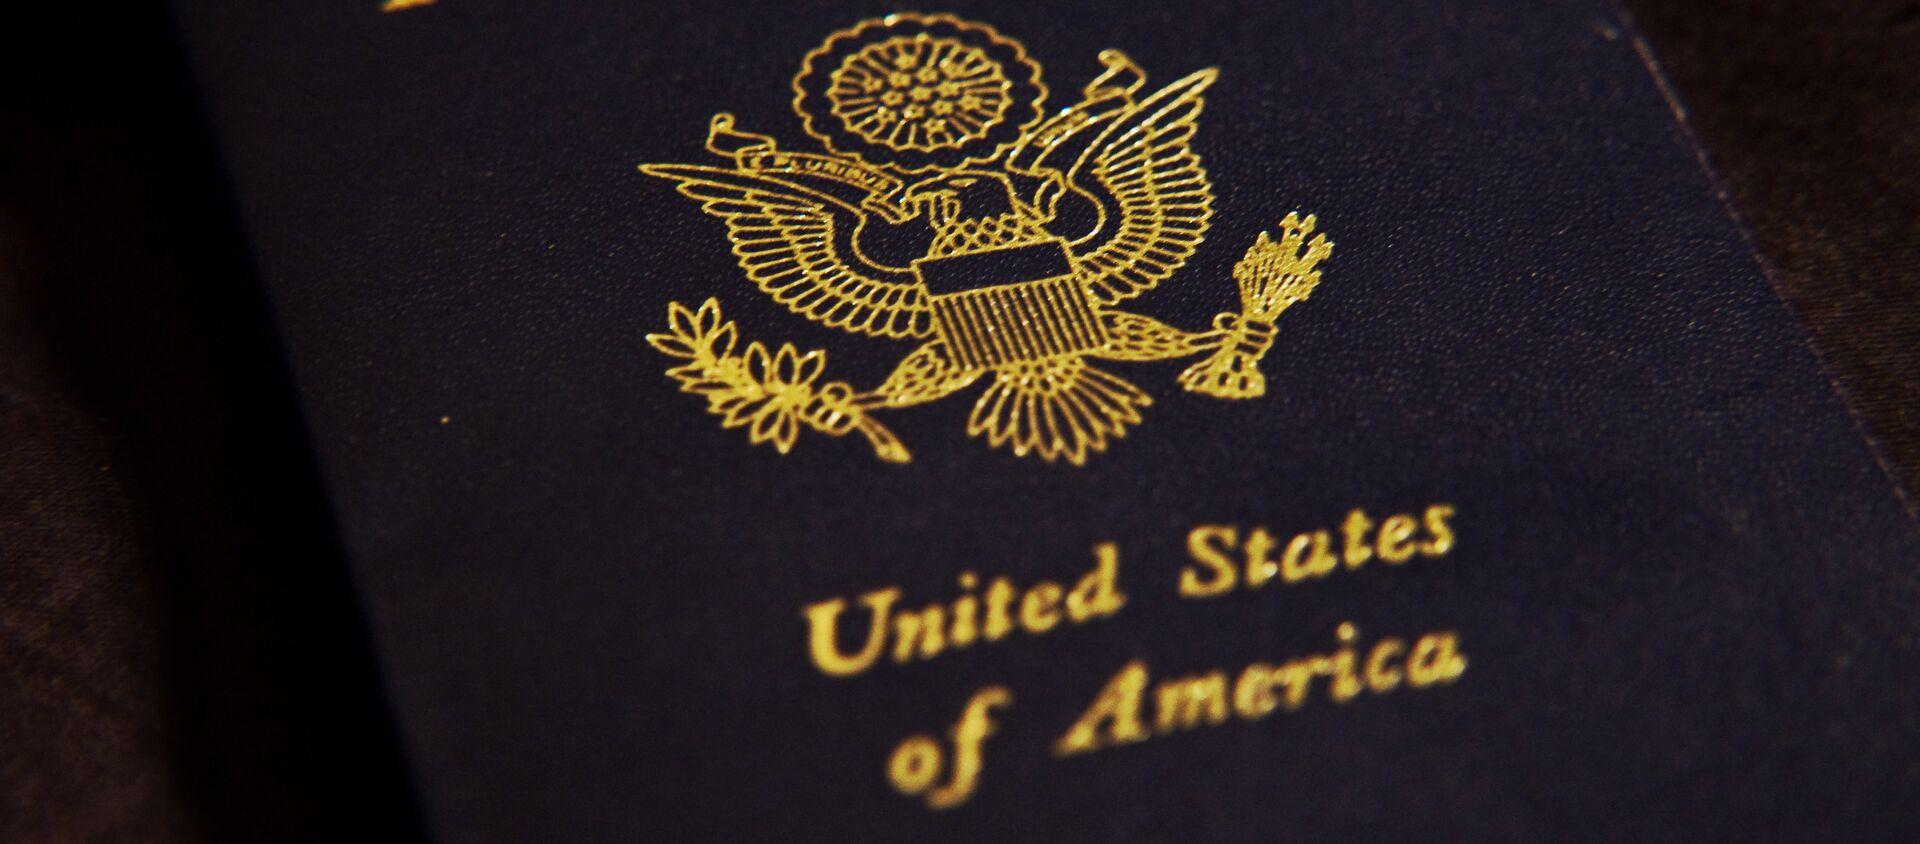 Pasaporte de EEUU (imagen referencial) - Sputnik Mundo, 1920, 19.01.2021